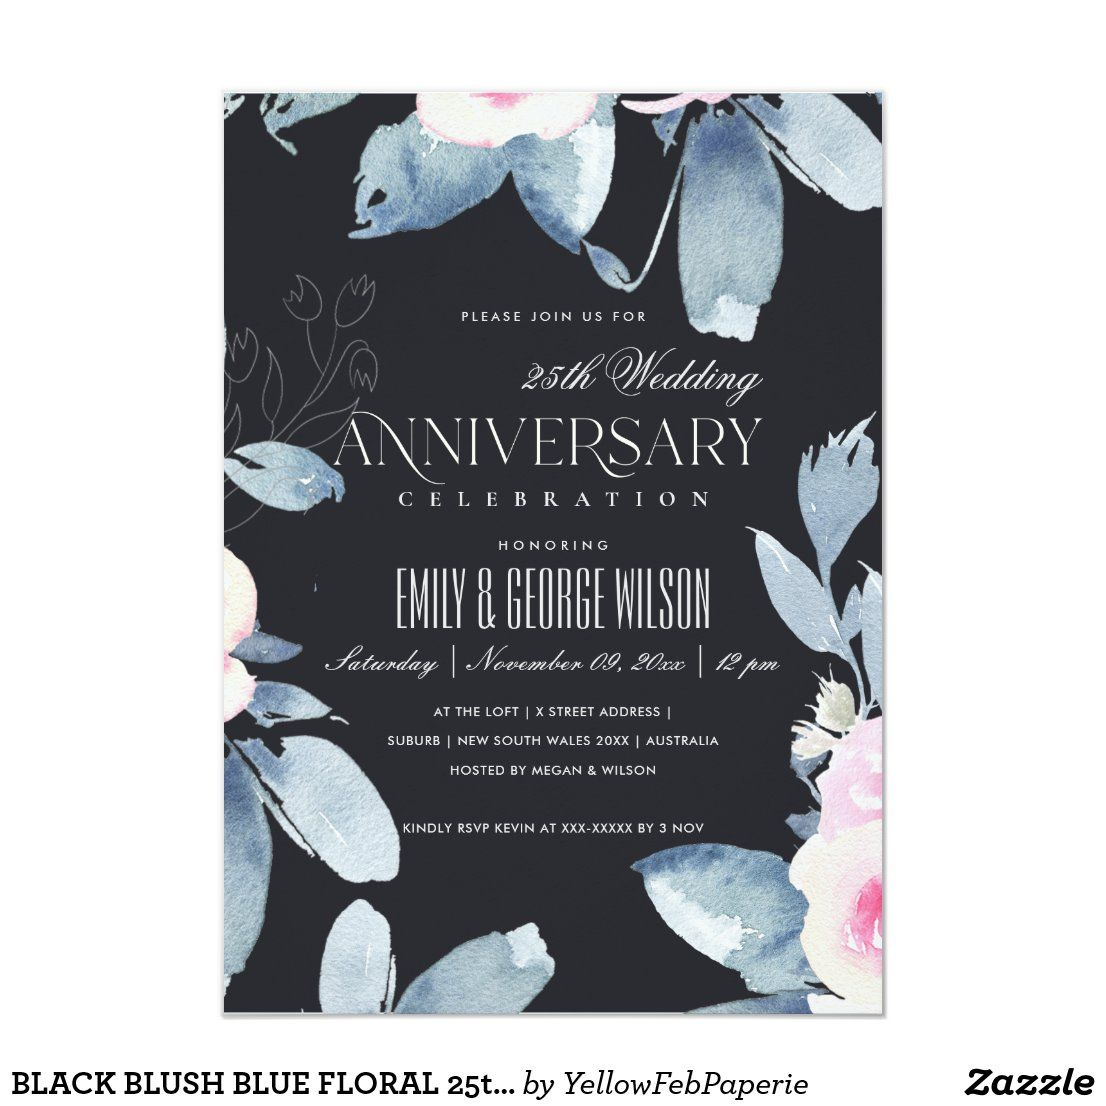 BLACK BLUSH BLUE FLORAL 25th ANY YEAR ANNIVERSARY